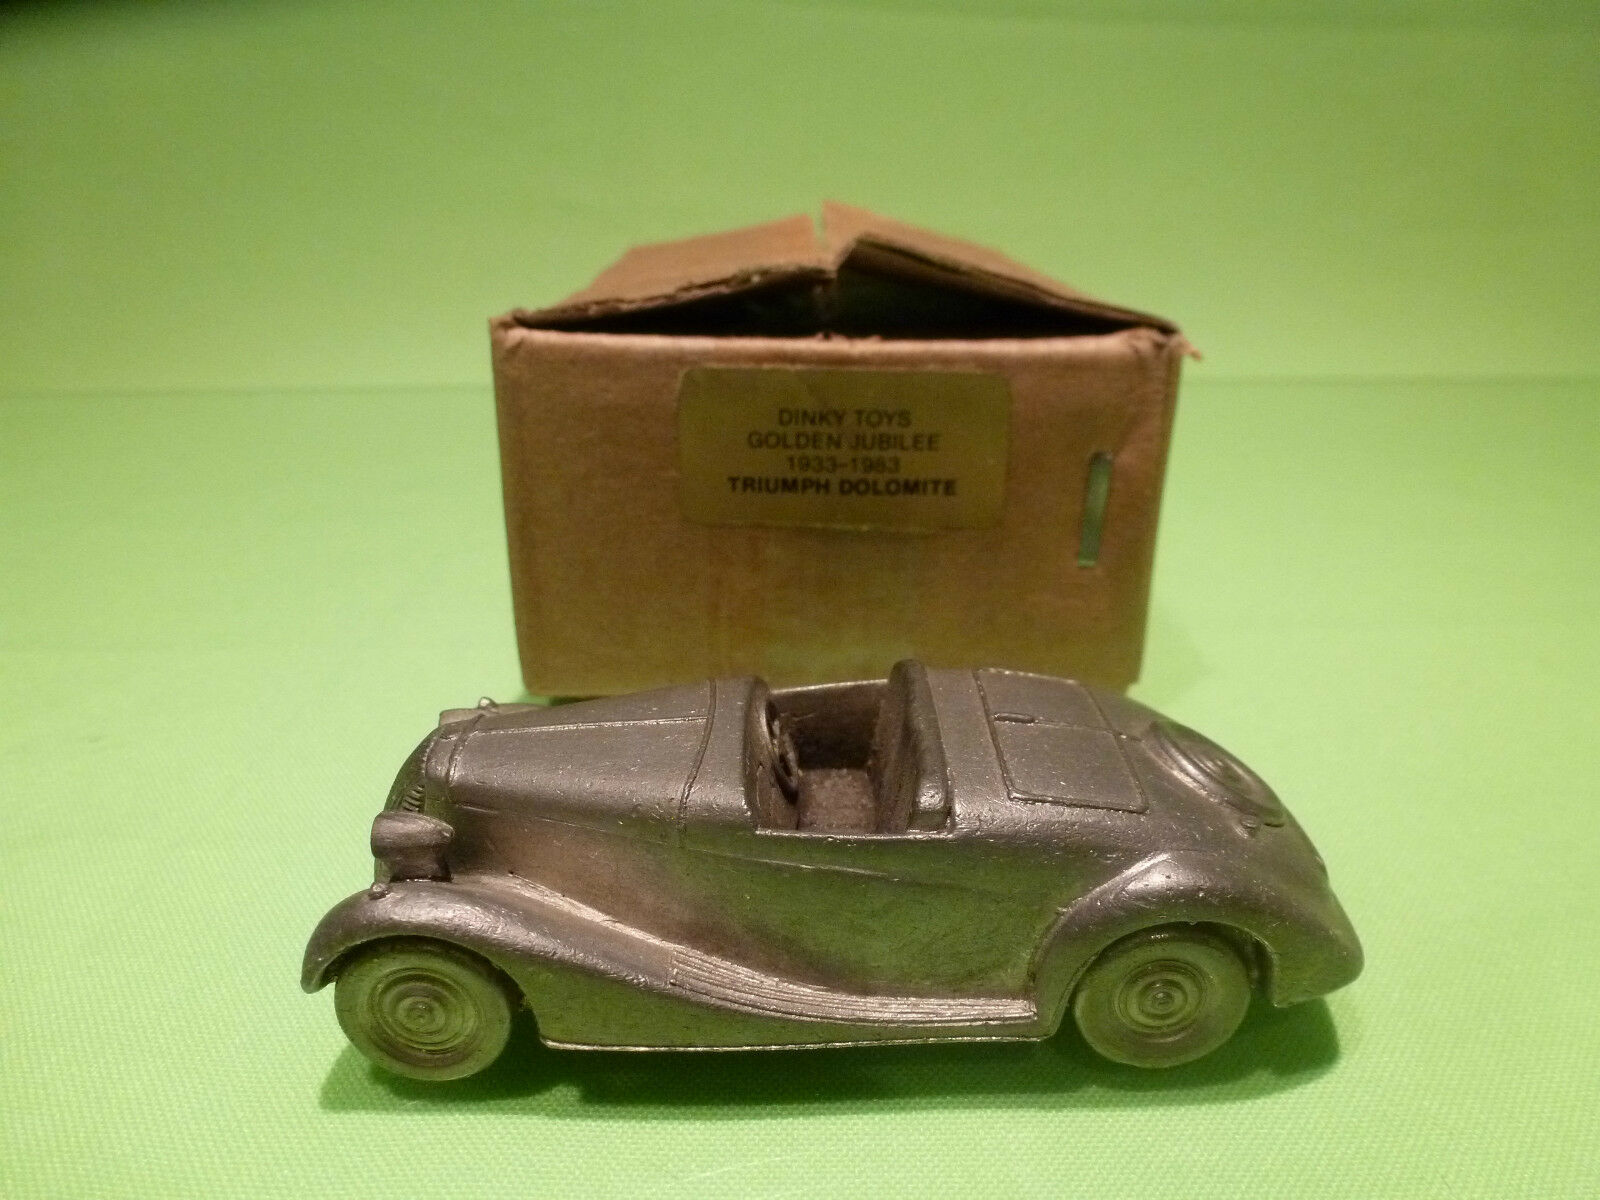 DINKY TOYS TRIUMPH DOLOMITE goldEN JUBILEE 1933 1983 - RARE SELTEN - GOOD IN BOX